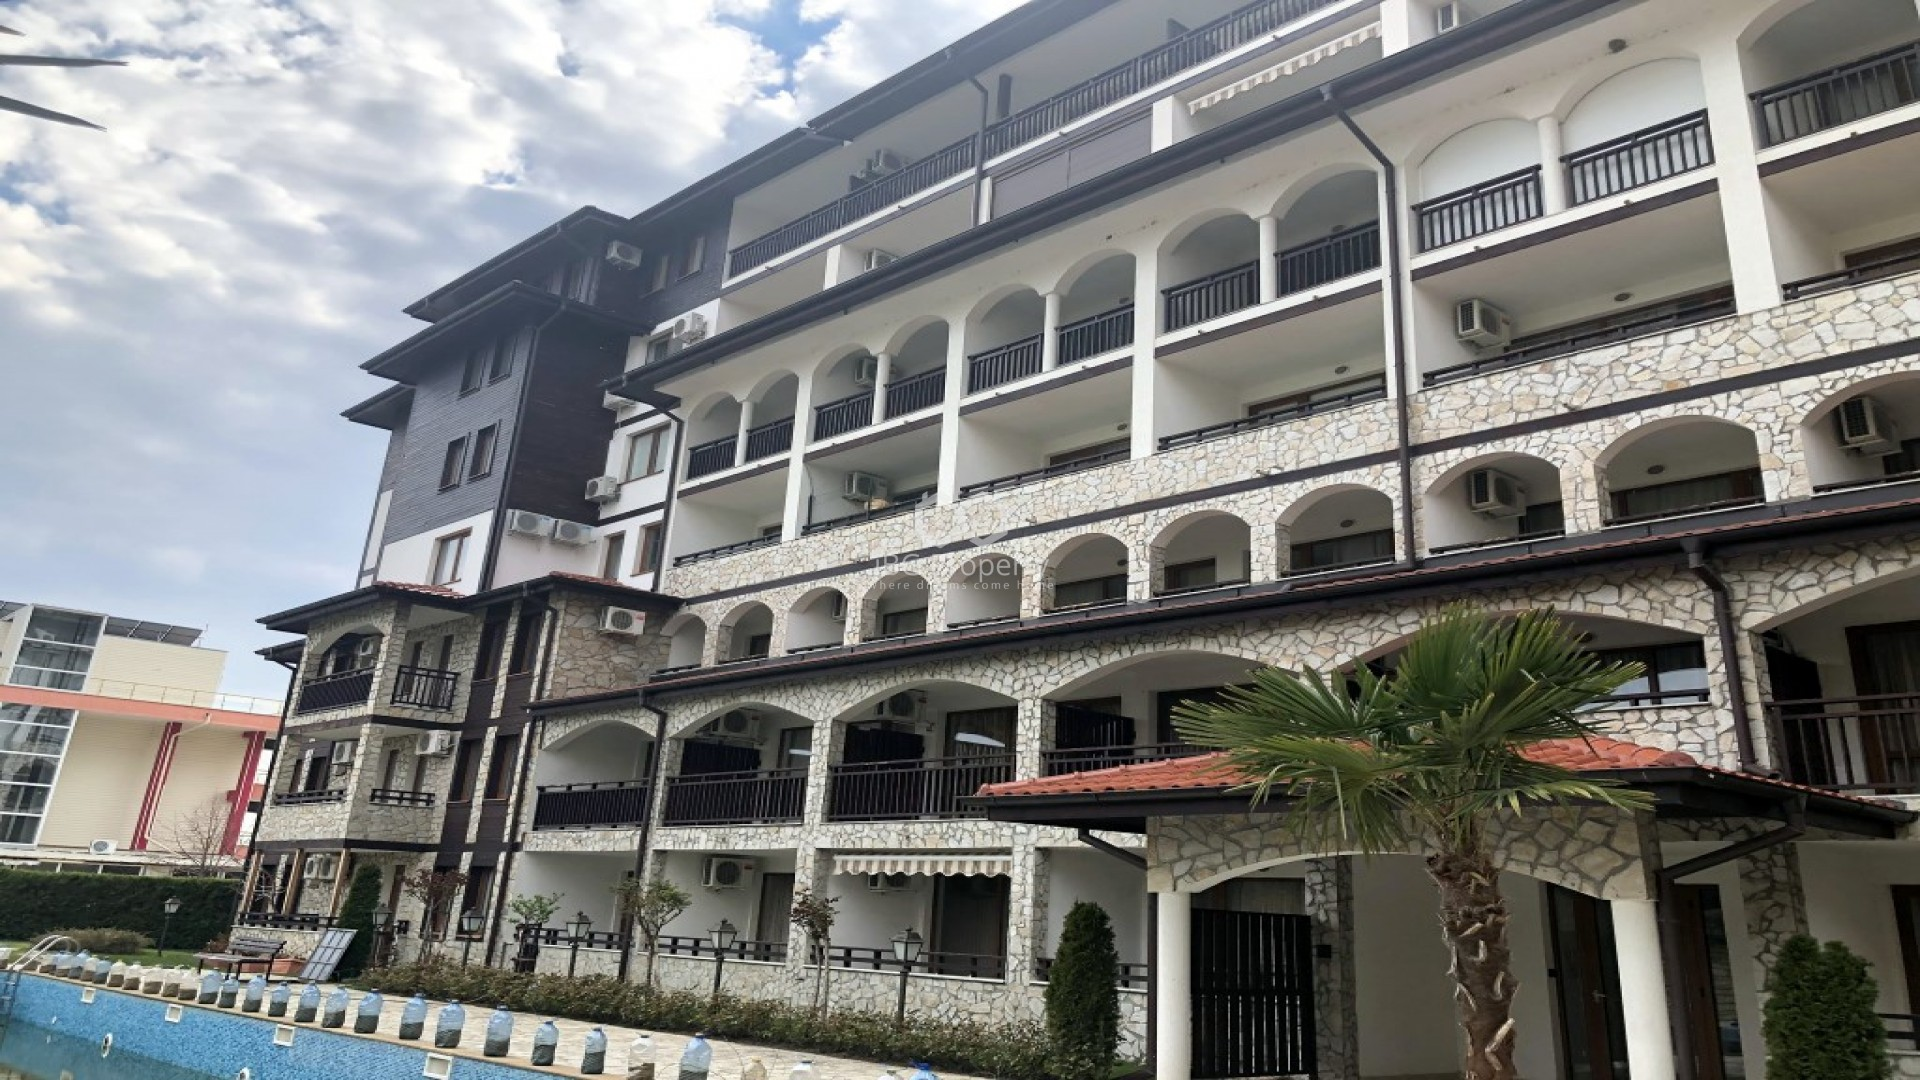 Однокомнатная квартира Святой Влас 35 m2